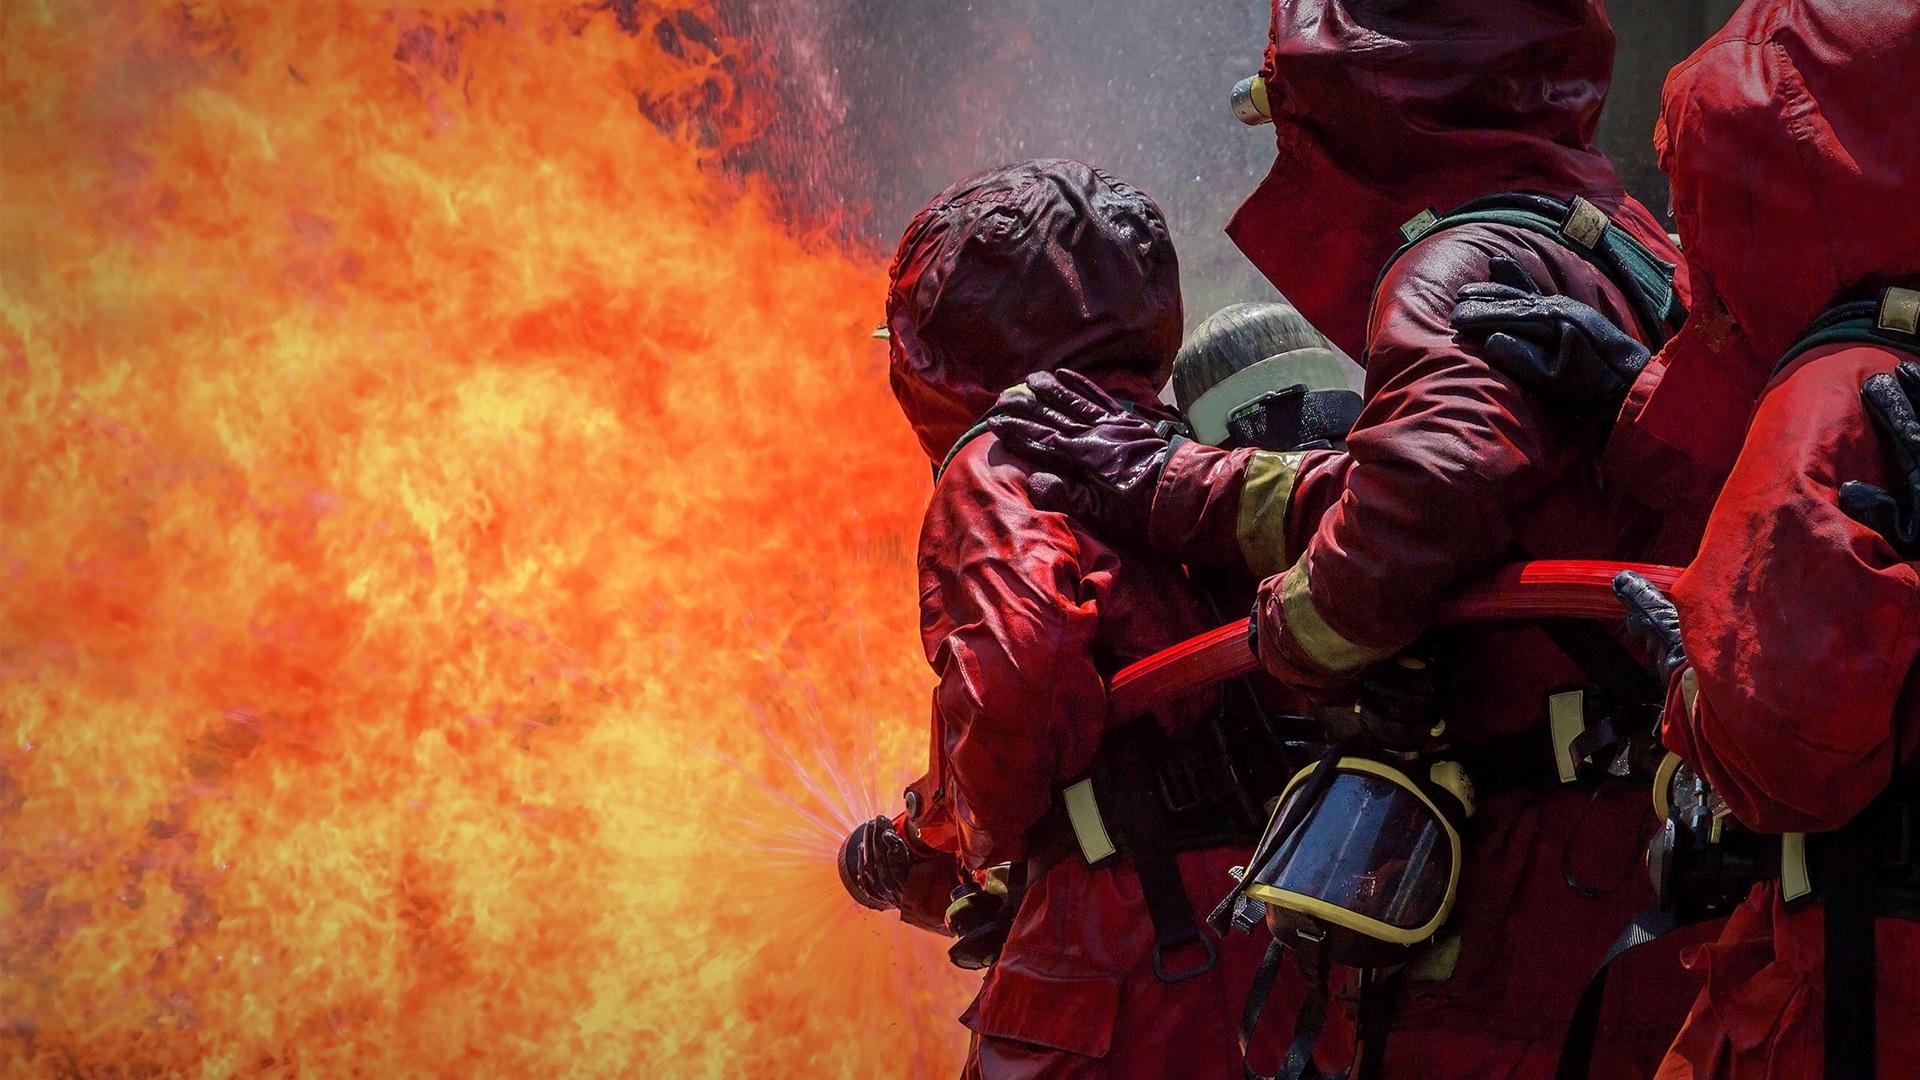 Fire protection segment